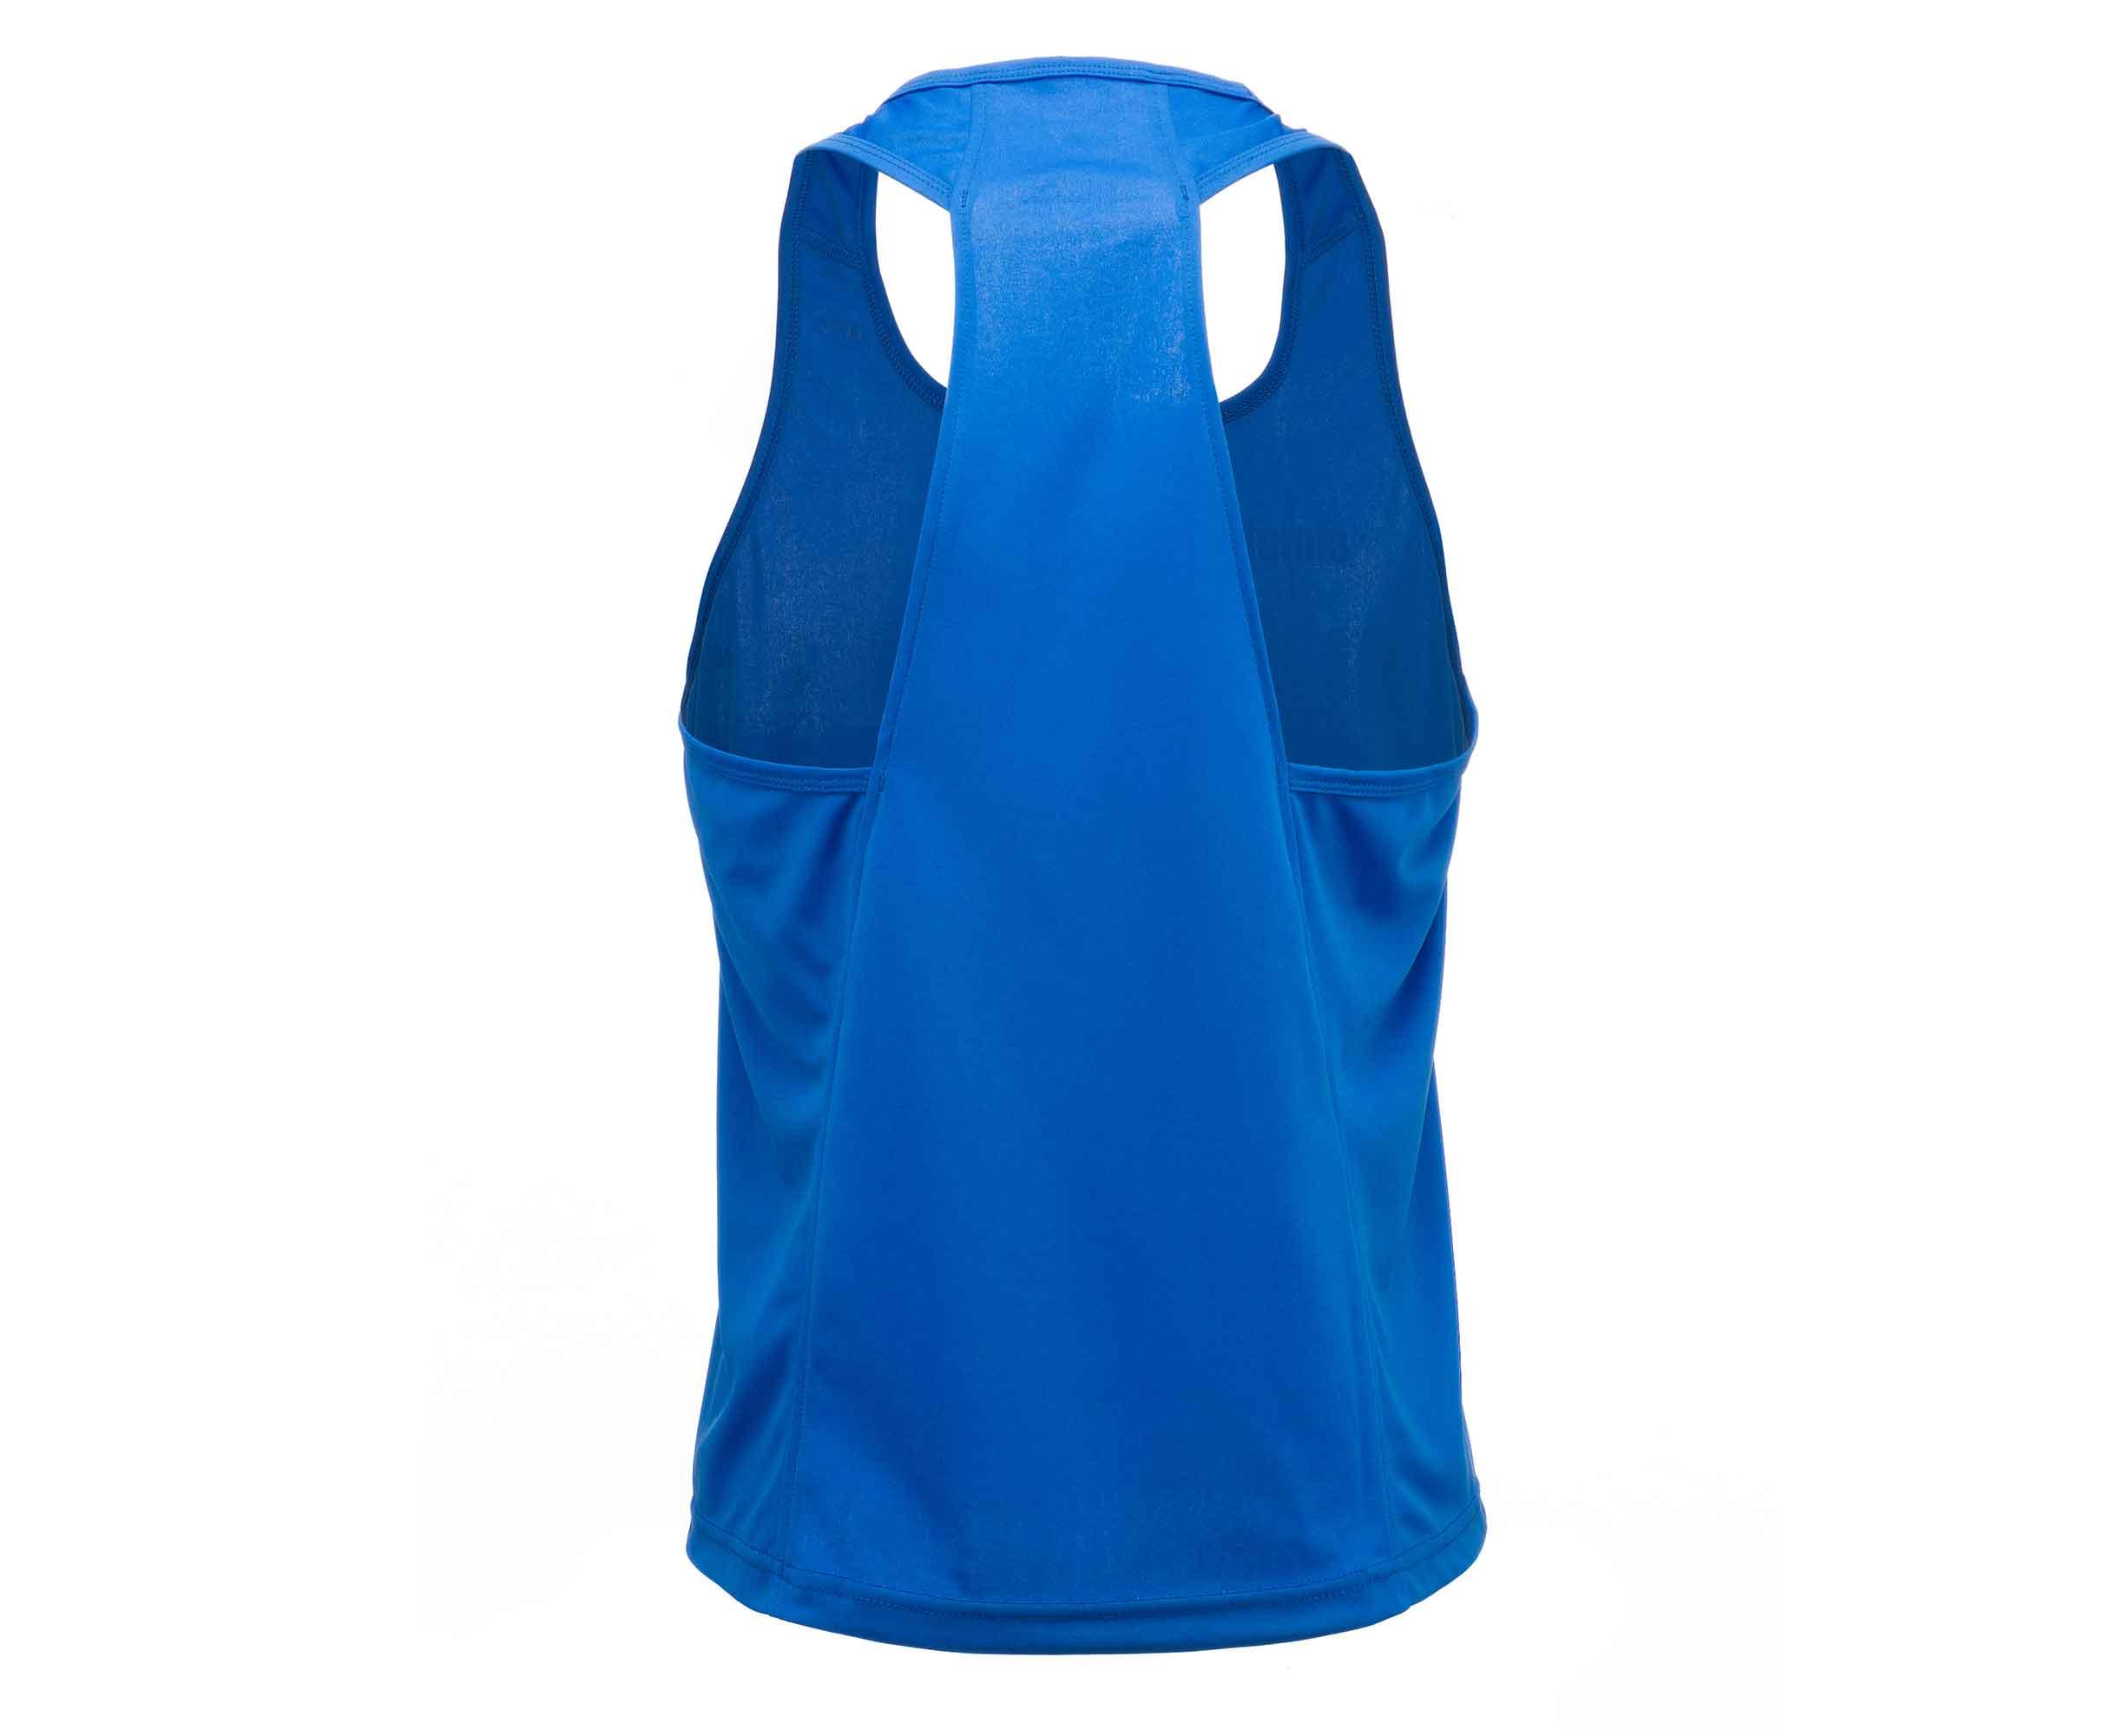 Майка боксерская Adidas Clinch Olimp синяя 2XL